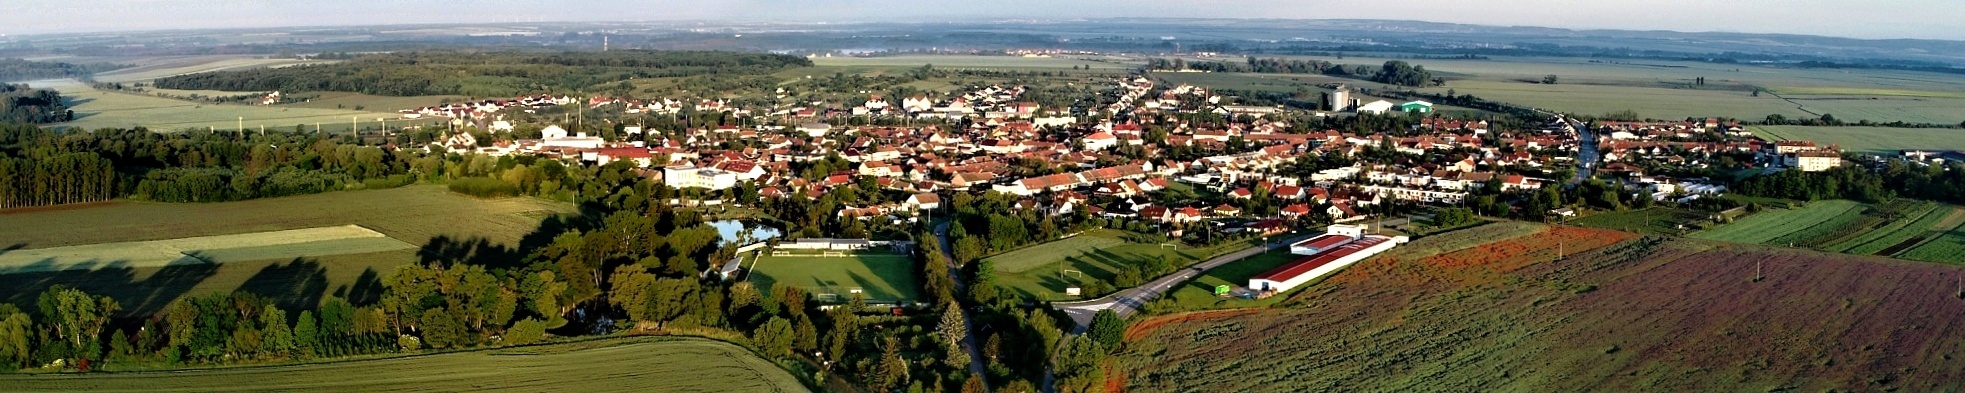 Vranovice panorama pohled od JV